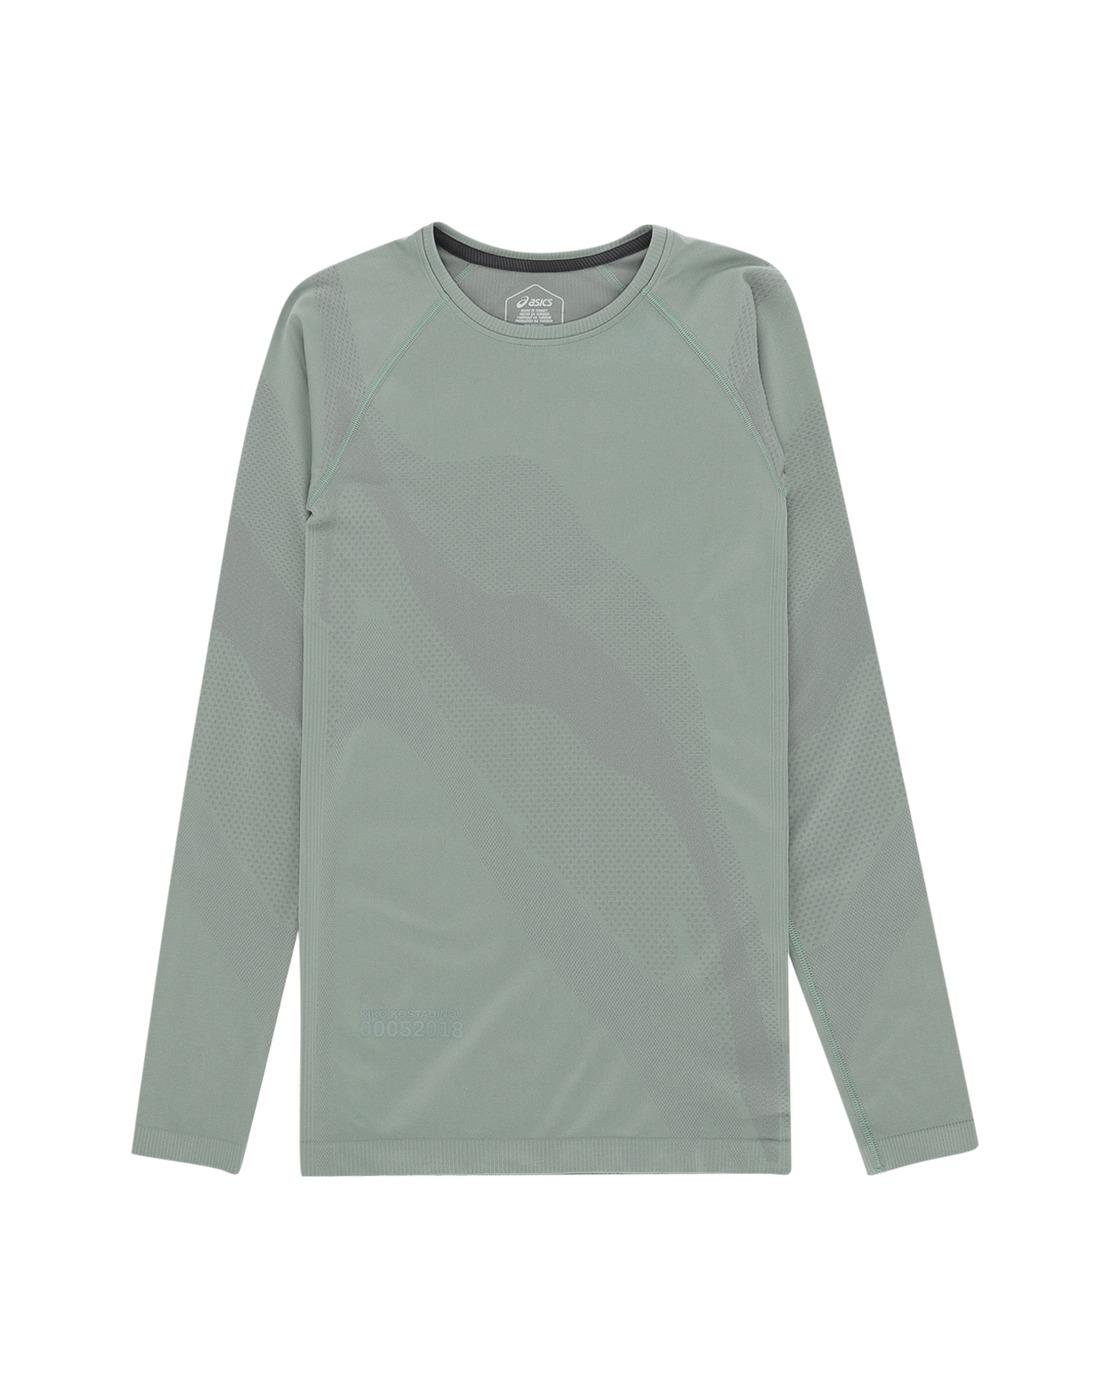 Asics Kiko Seamless Top Slate Grey